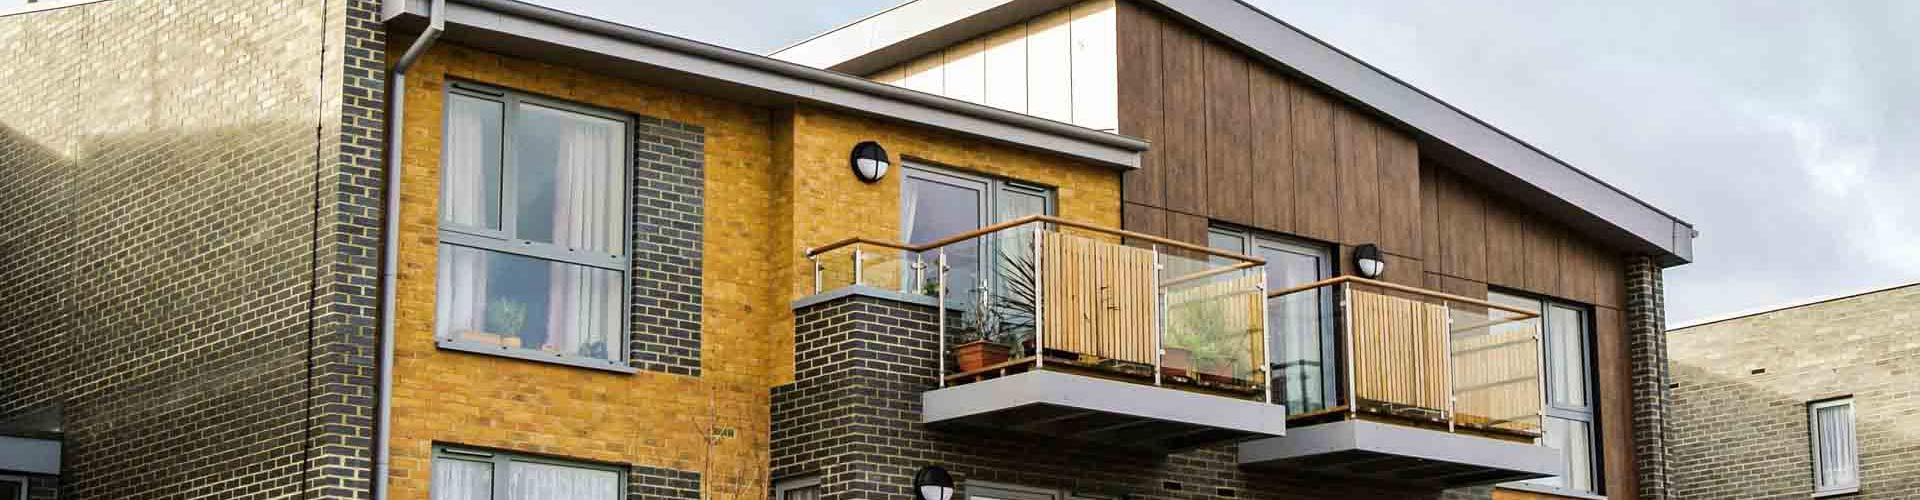 Collinwood Court 2, T&T Carpentry & Facades Slide